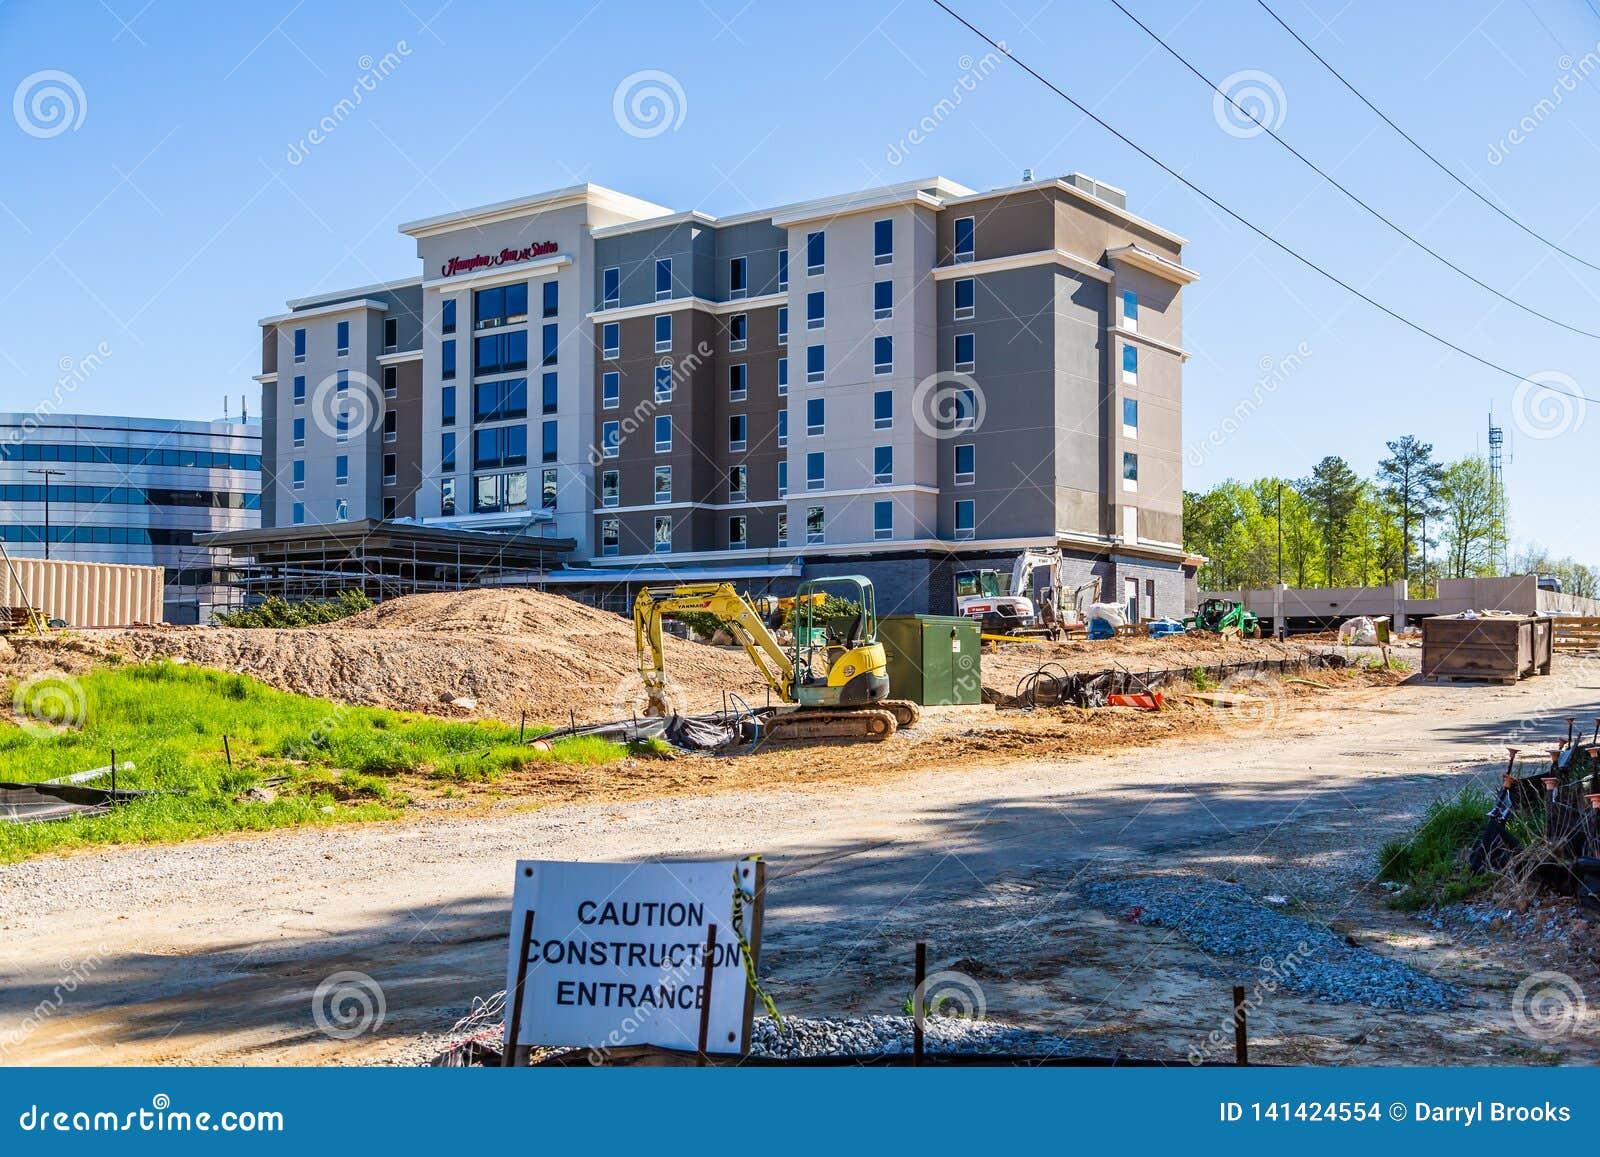 Hampton Inn Under Construction